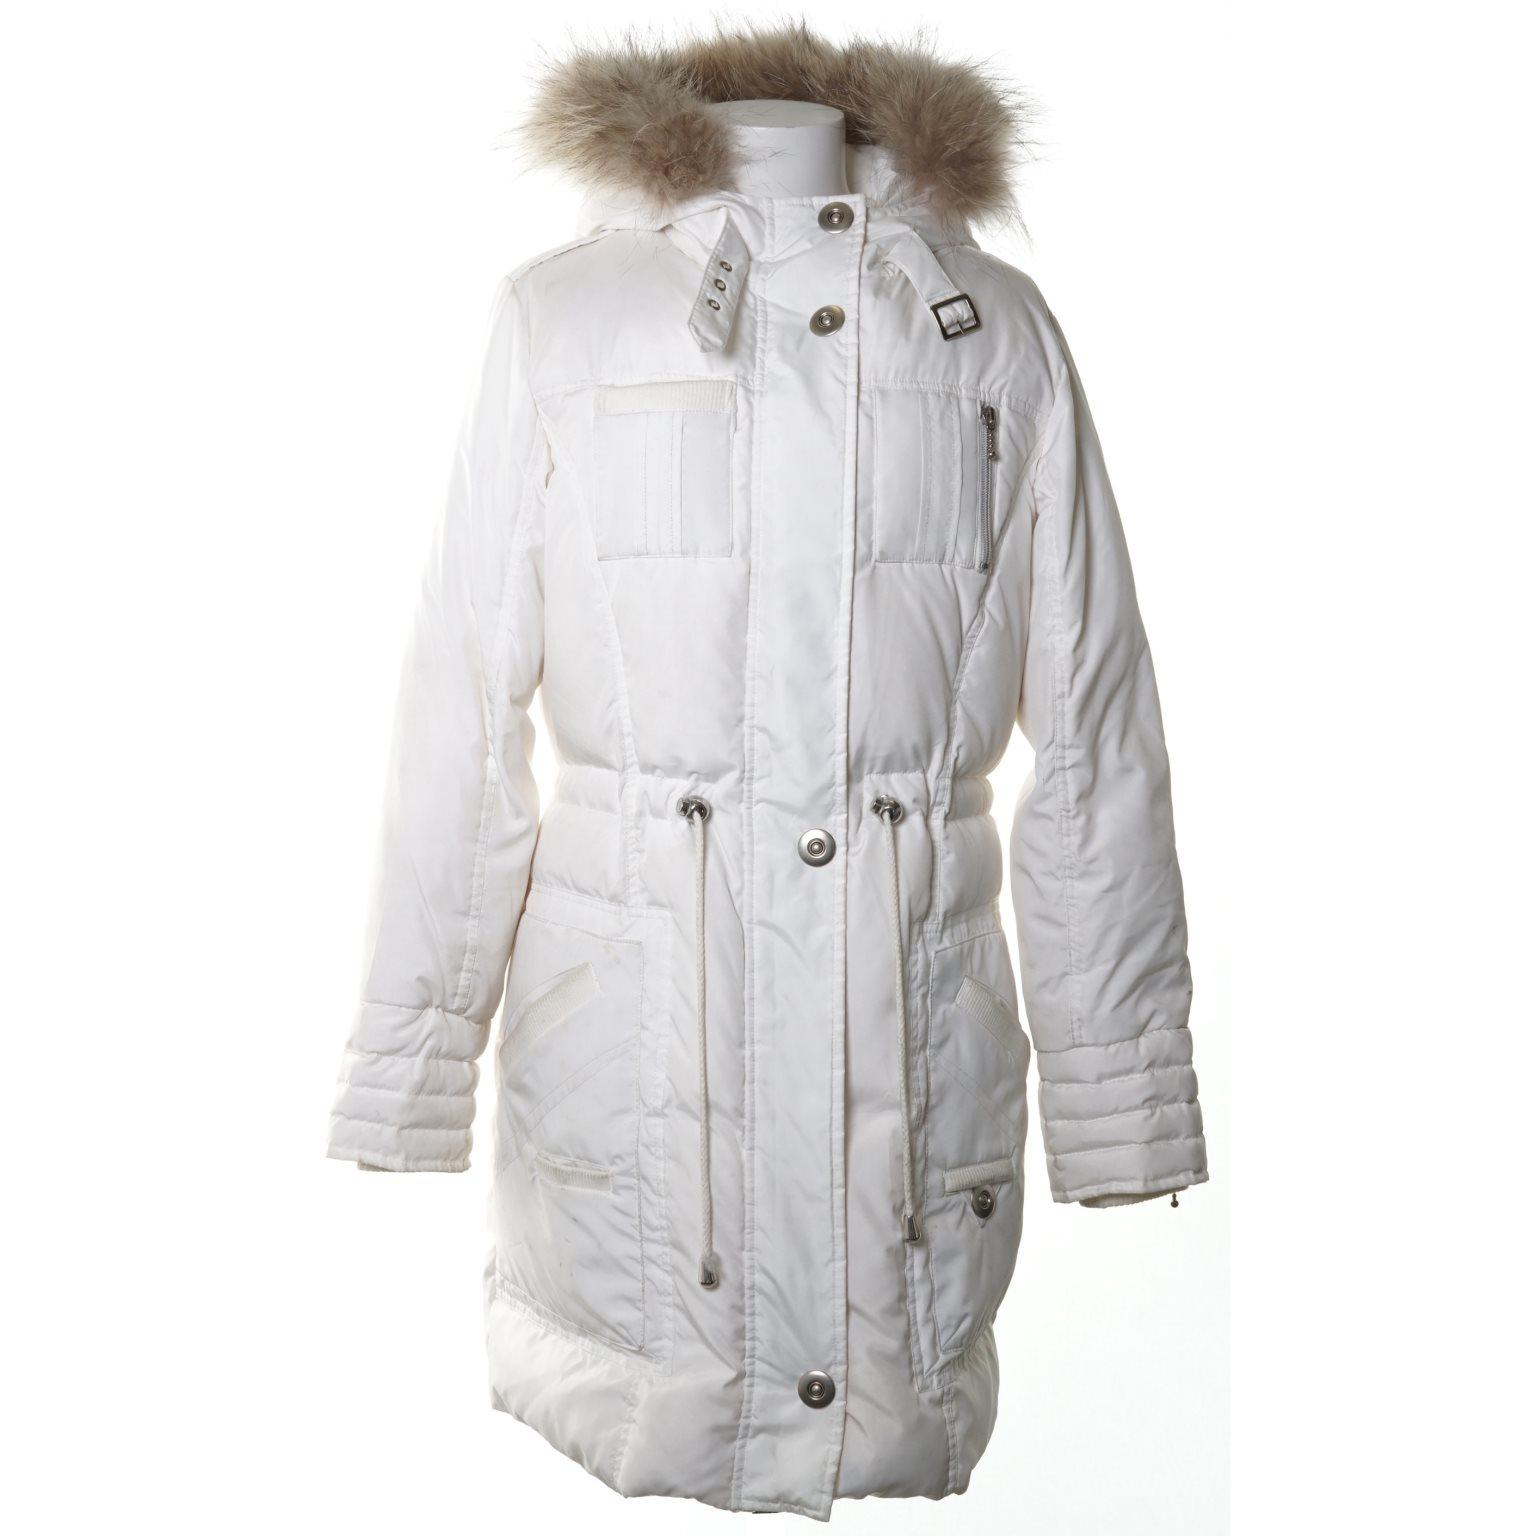 jacka med vit päls